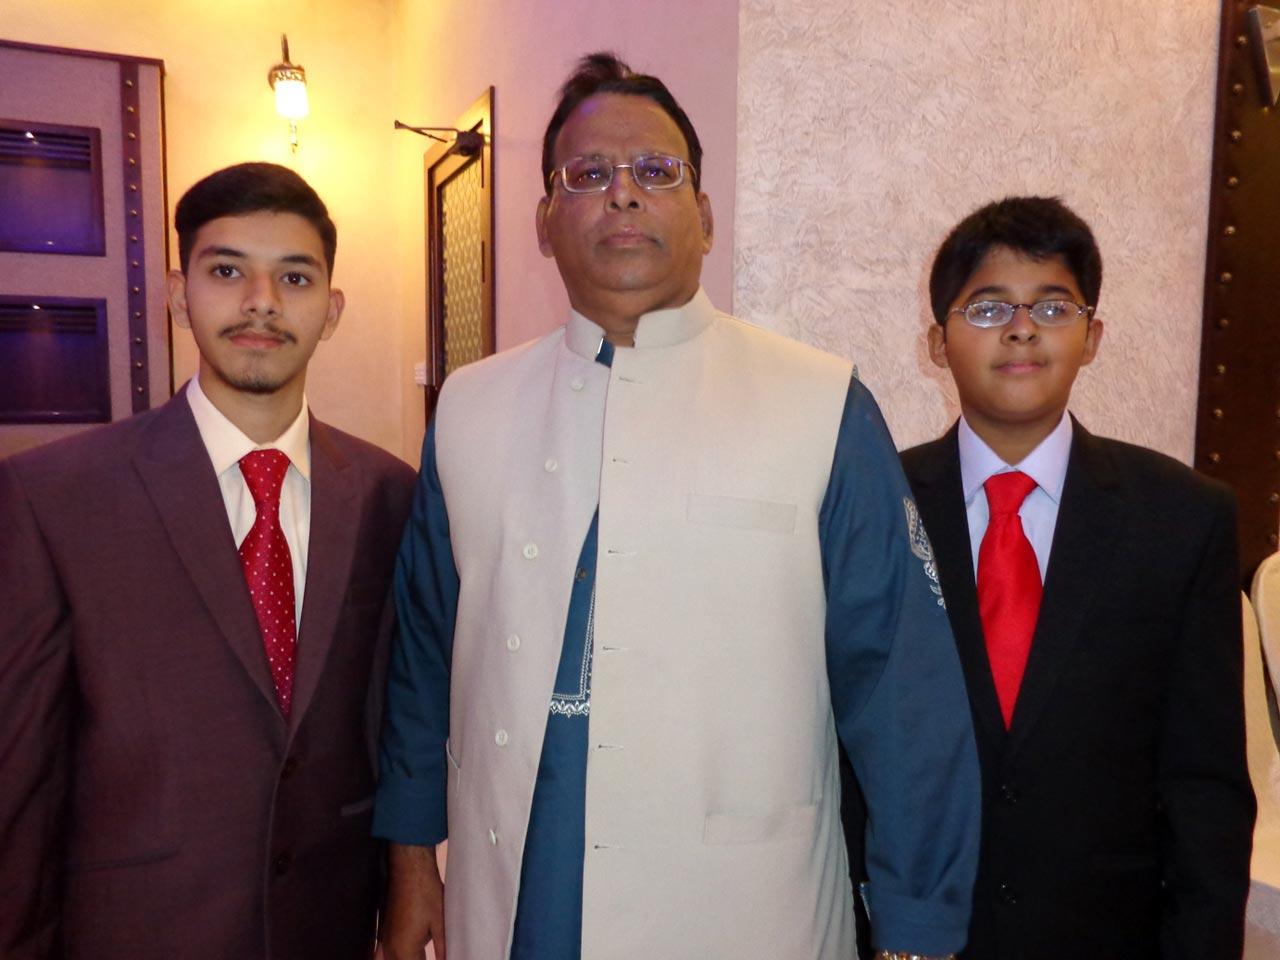 Obaid Ur Rehman, Dr. Ata Ur Rehman, Habib Ur Rehman